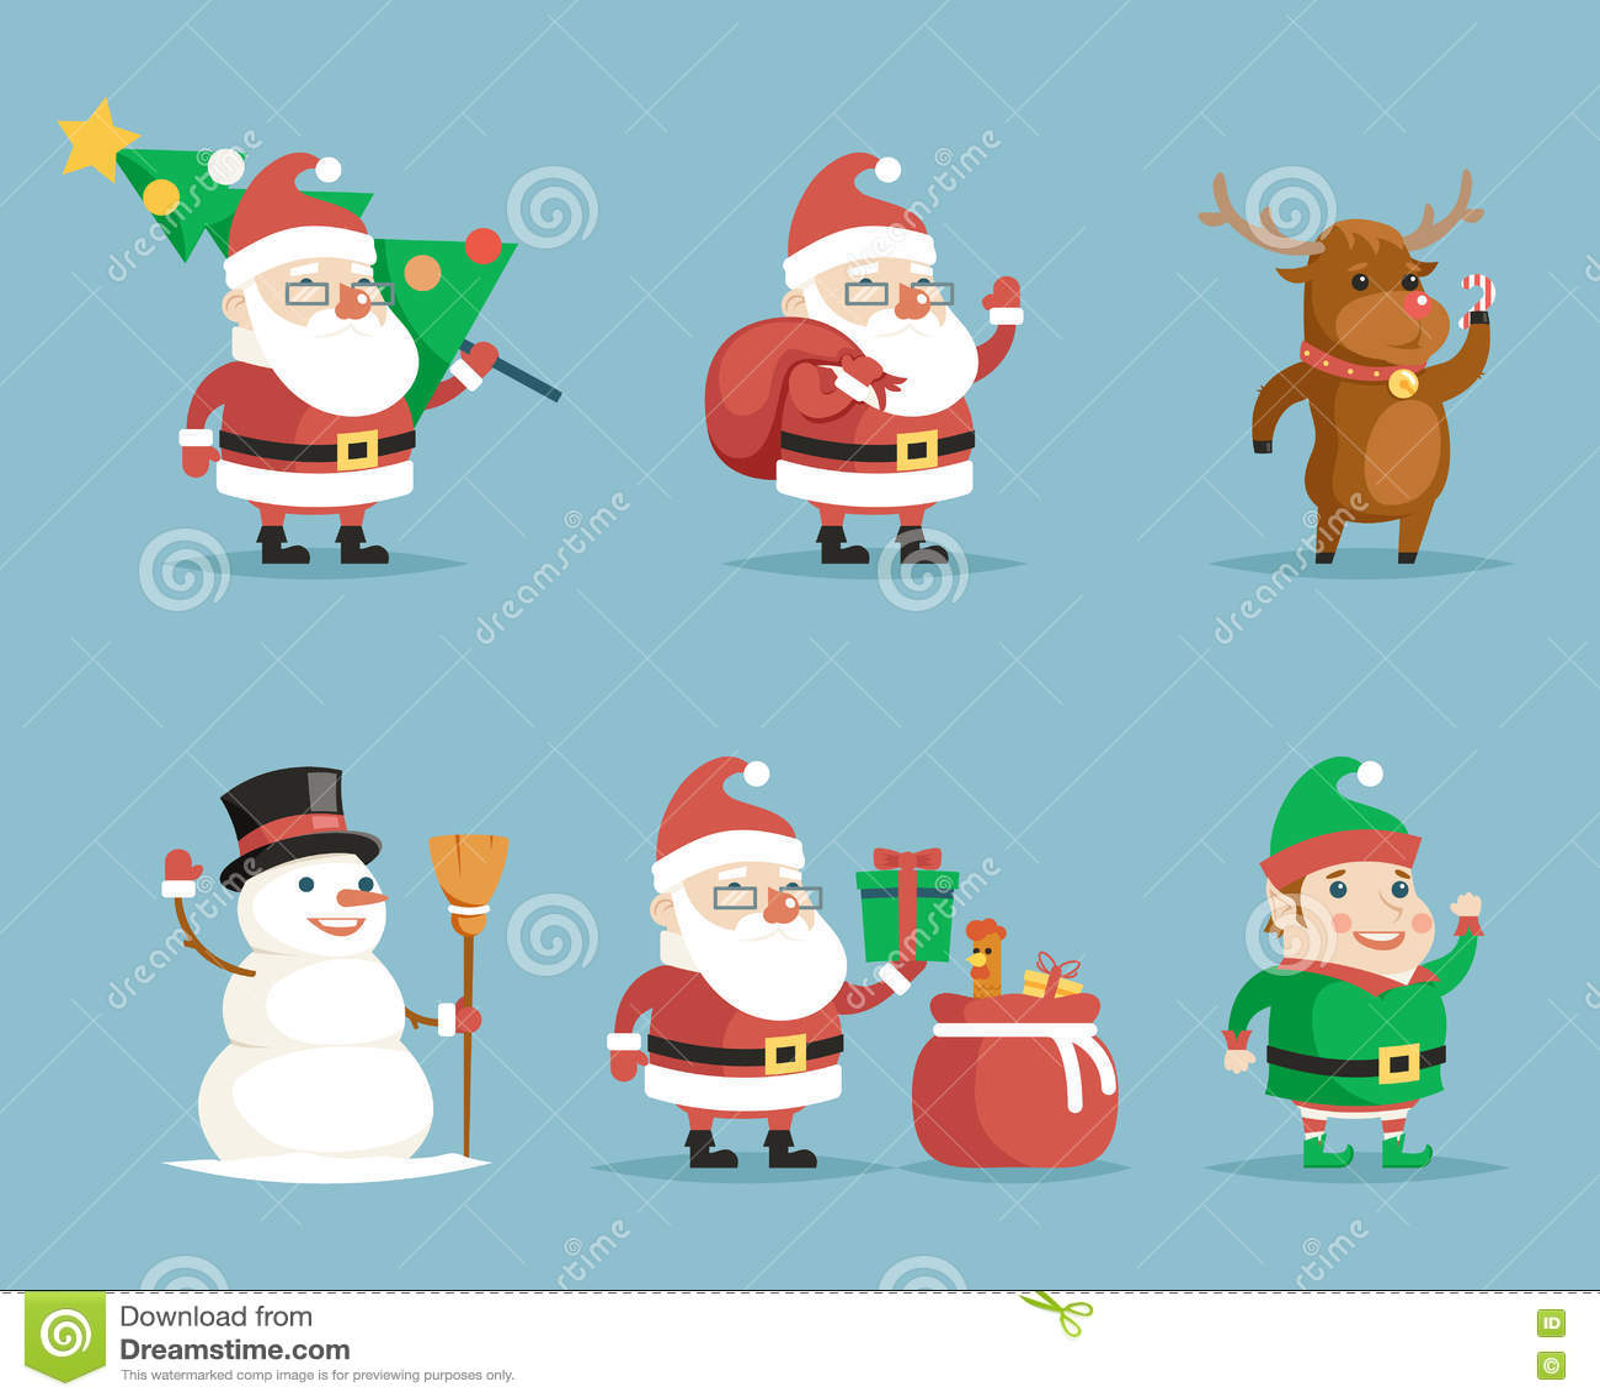 Elf Deer Snowman Santa Claus Cartoon Characters Christmas